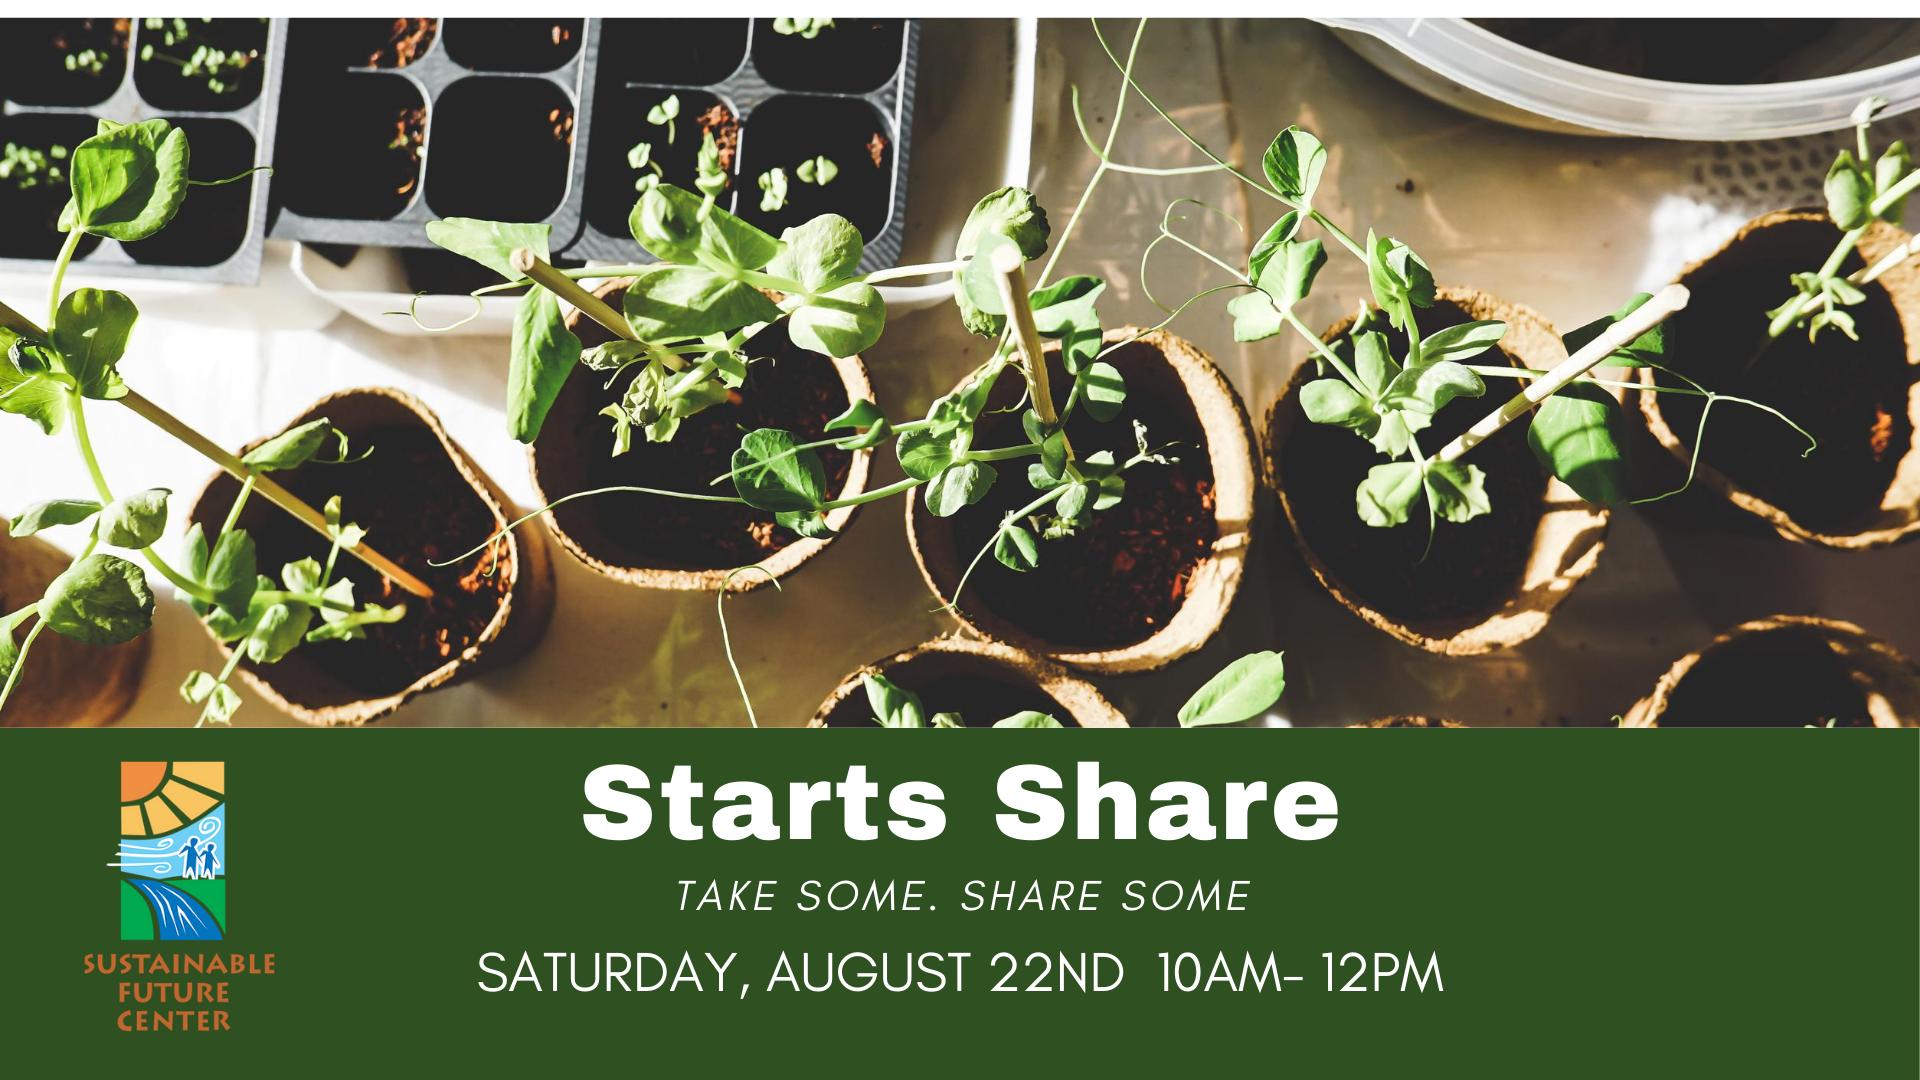 Starts Share